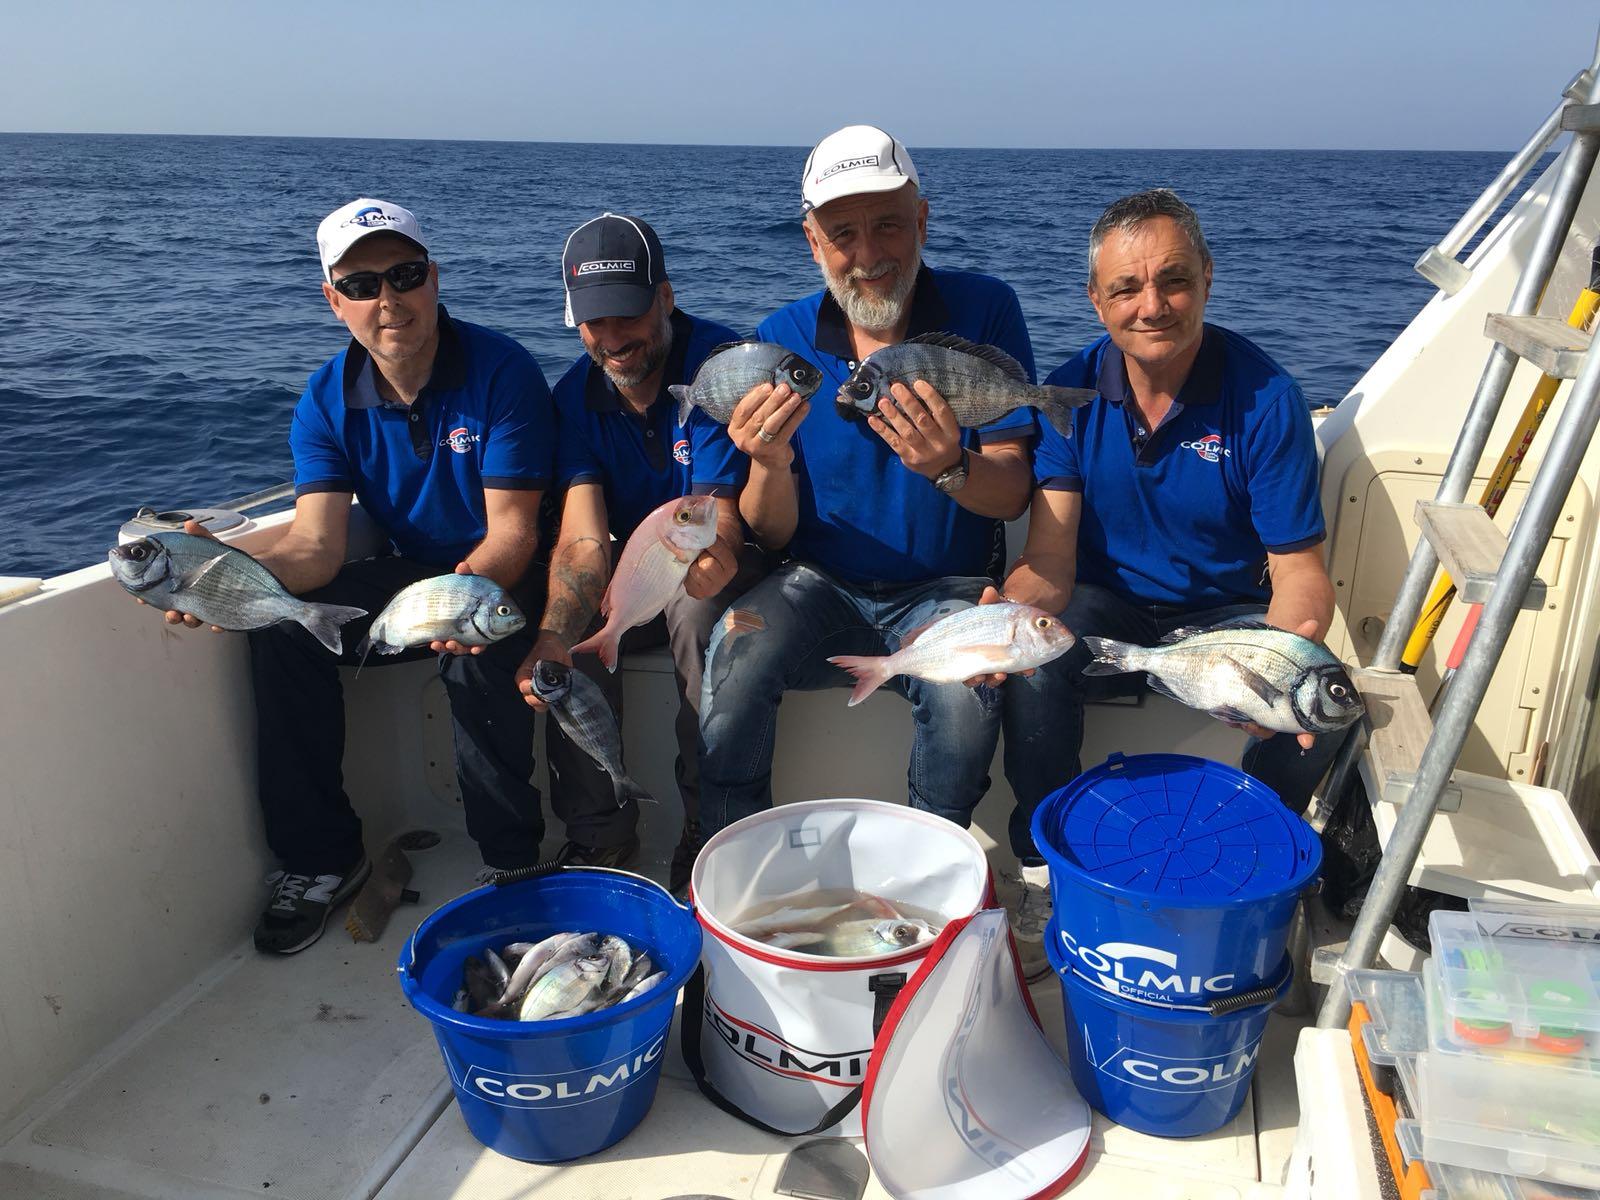 da destra Marco Melonii, Gianluca Magri, Valerio Mastracci  e Jacopo Falsini